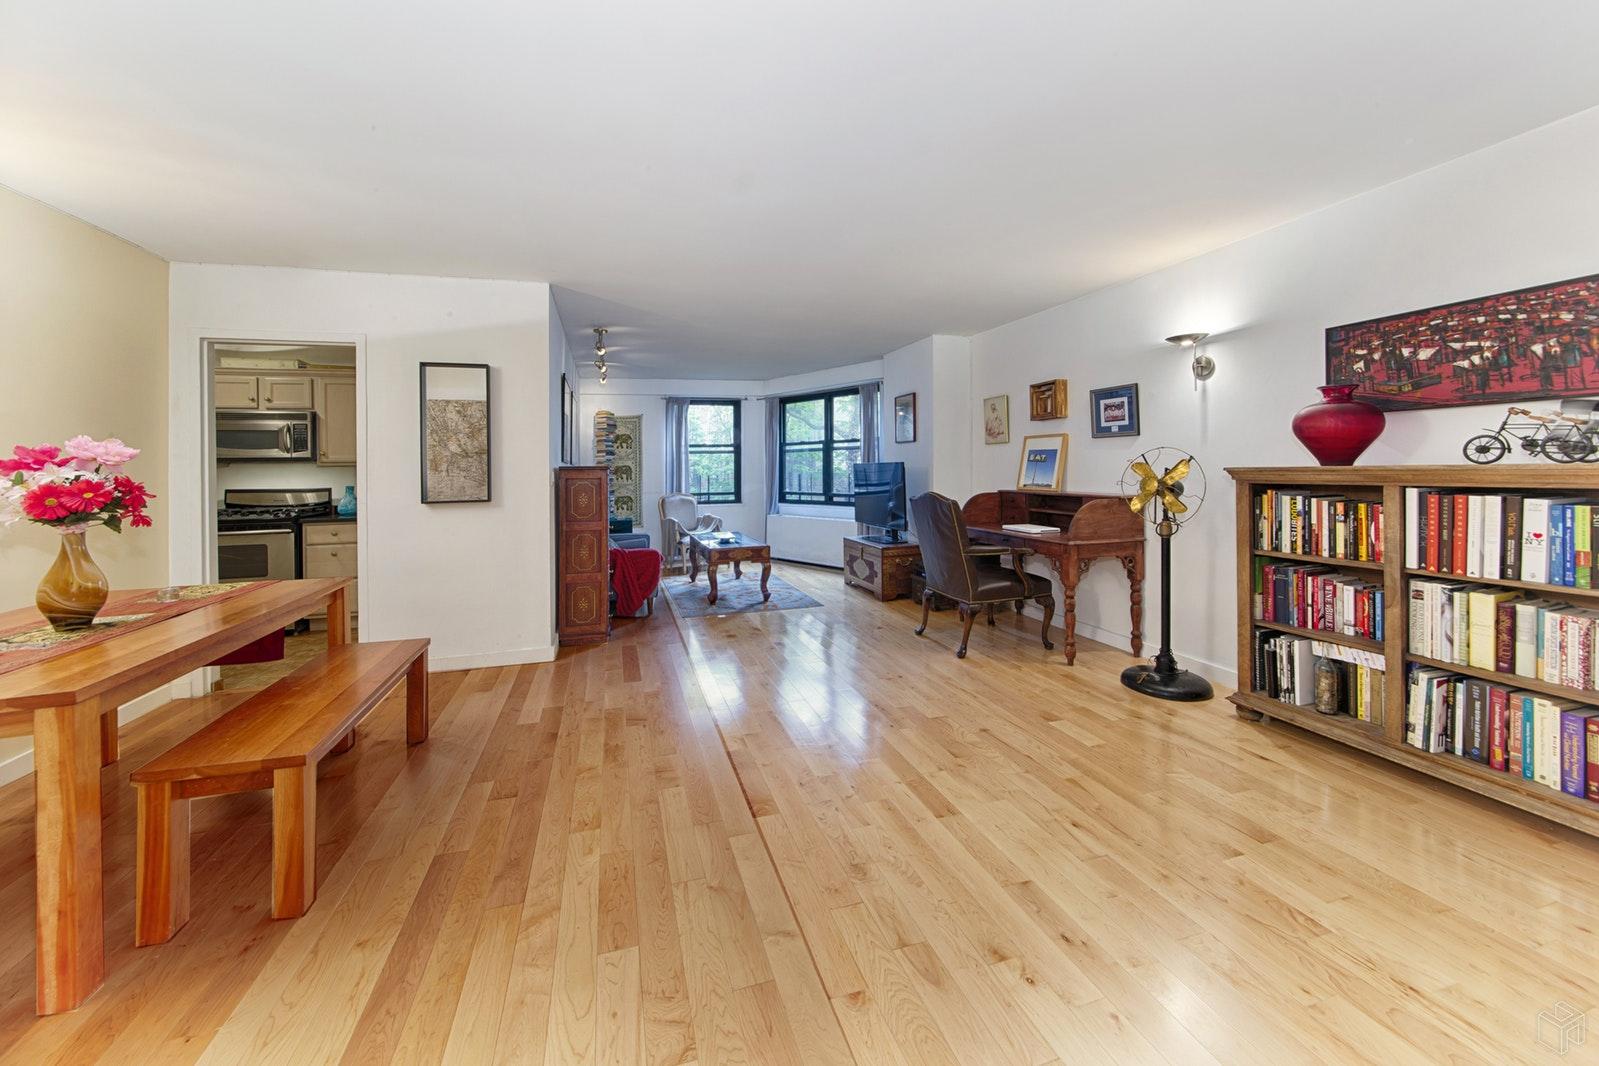 245 EAST 25TH STREET 4A, Gramercy Park, $725,000, Web #: 19014993